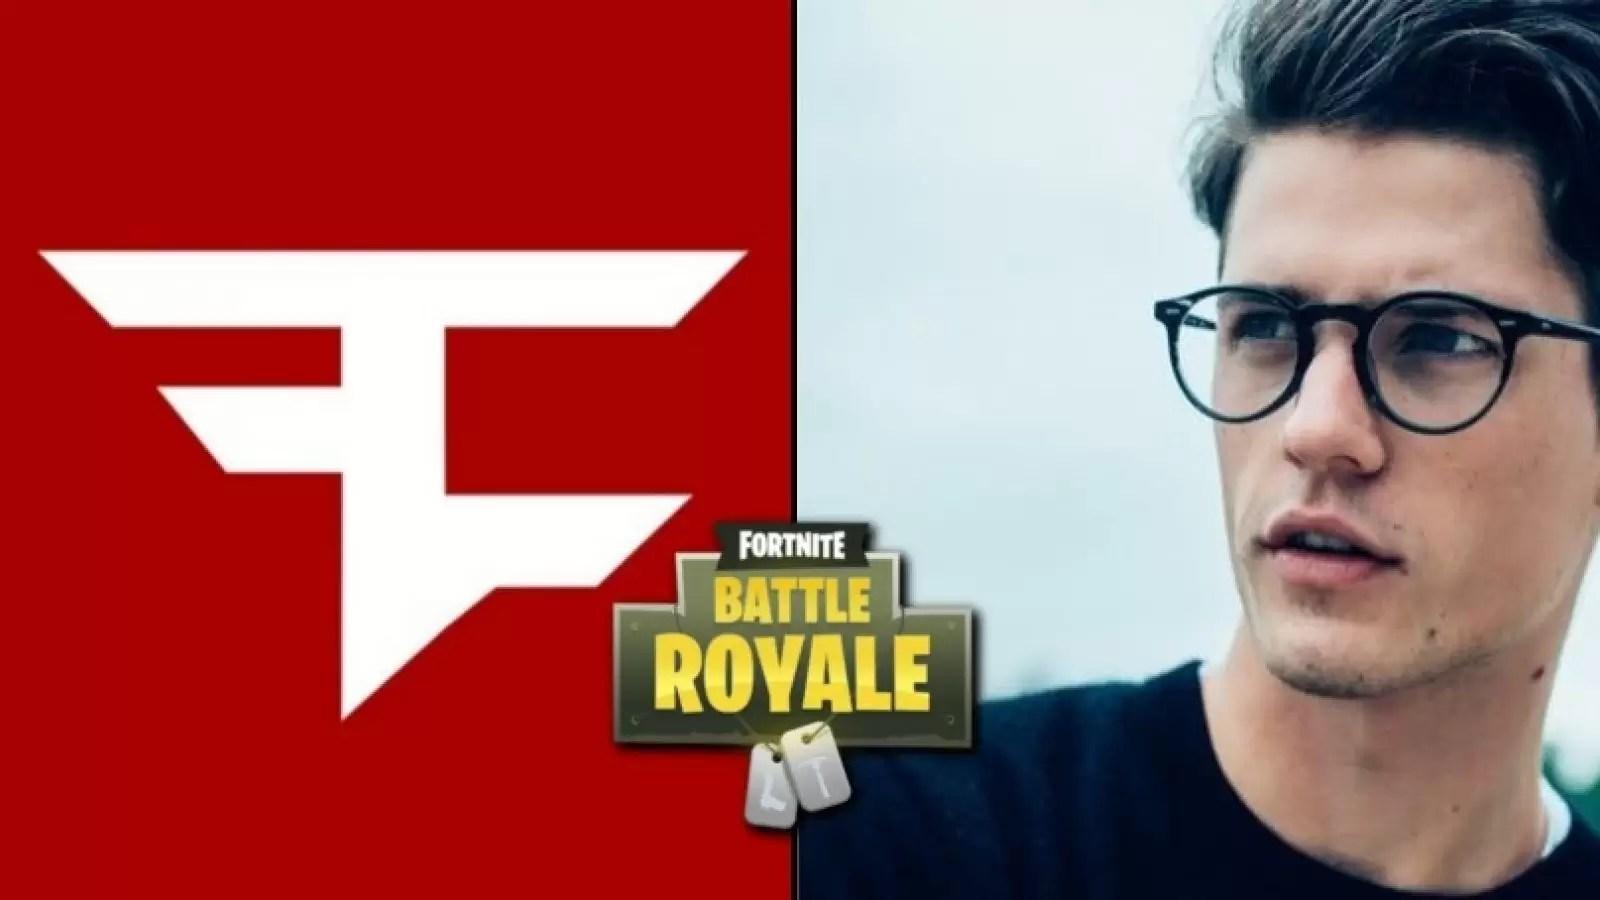 Član ekipe Faze Clan suspendovan sa Fortnite Fall Skirmish turnira zbog varanja, FunkBomb izbačen